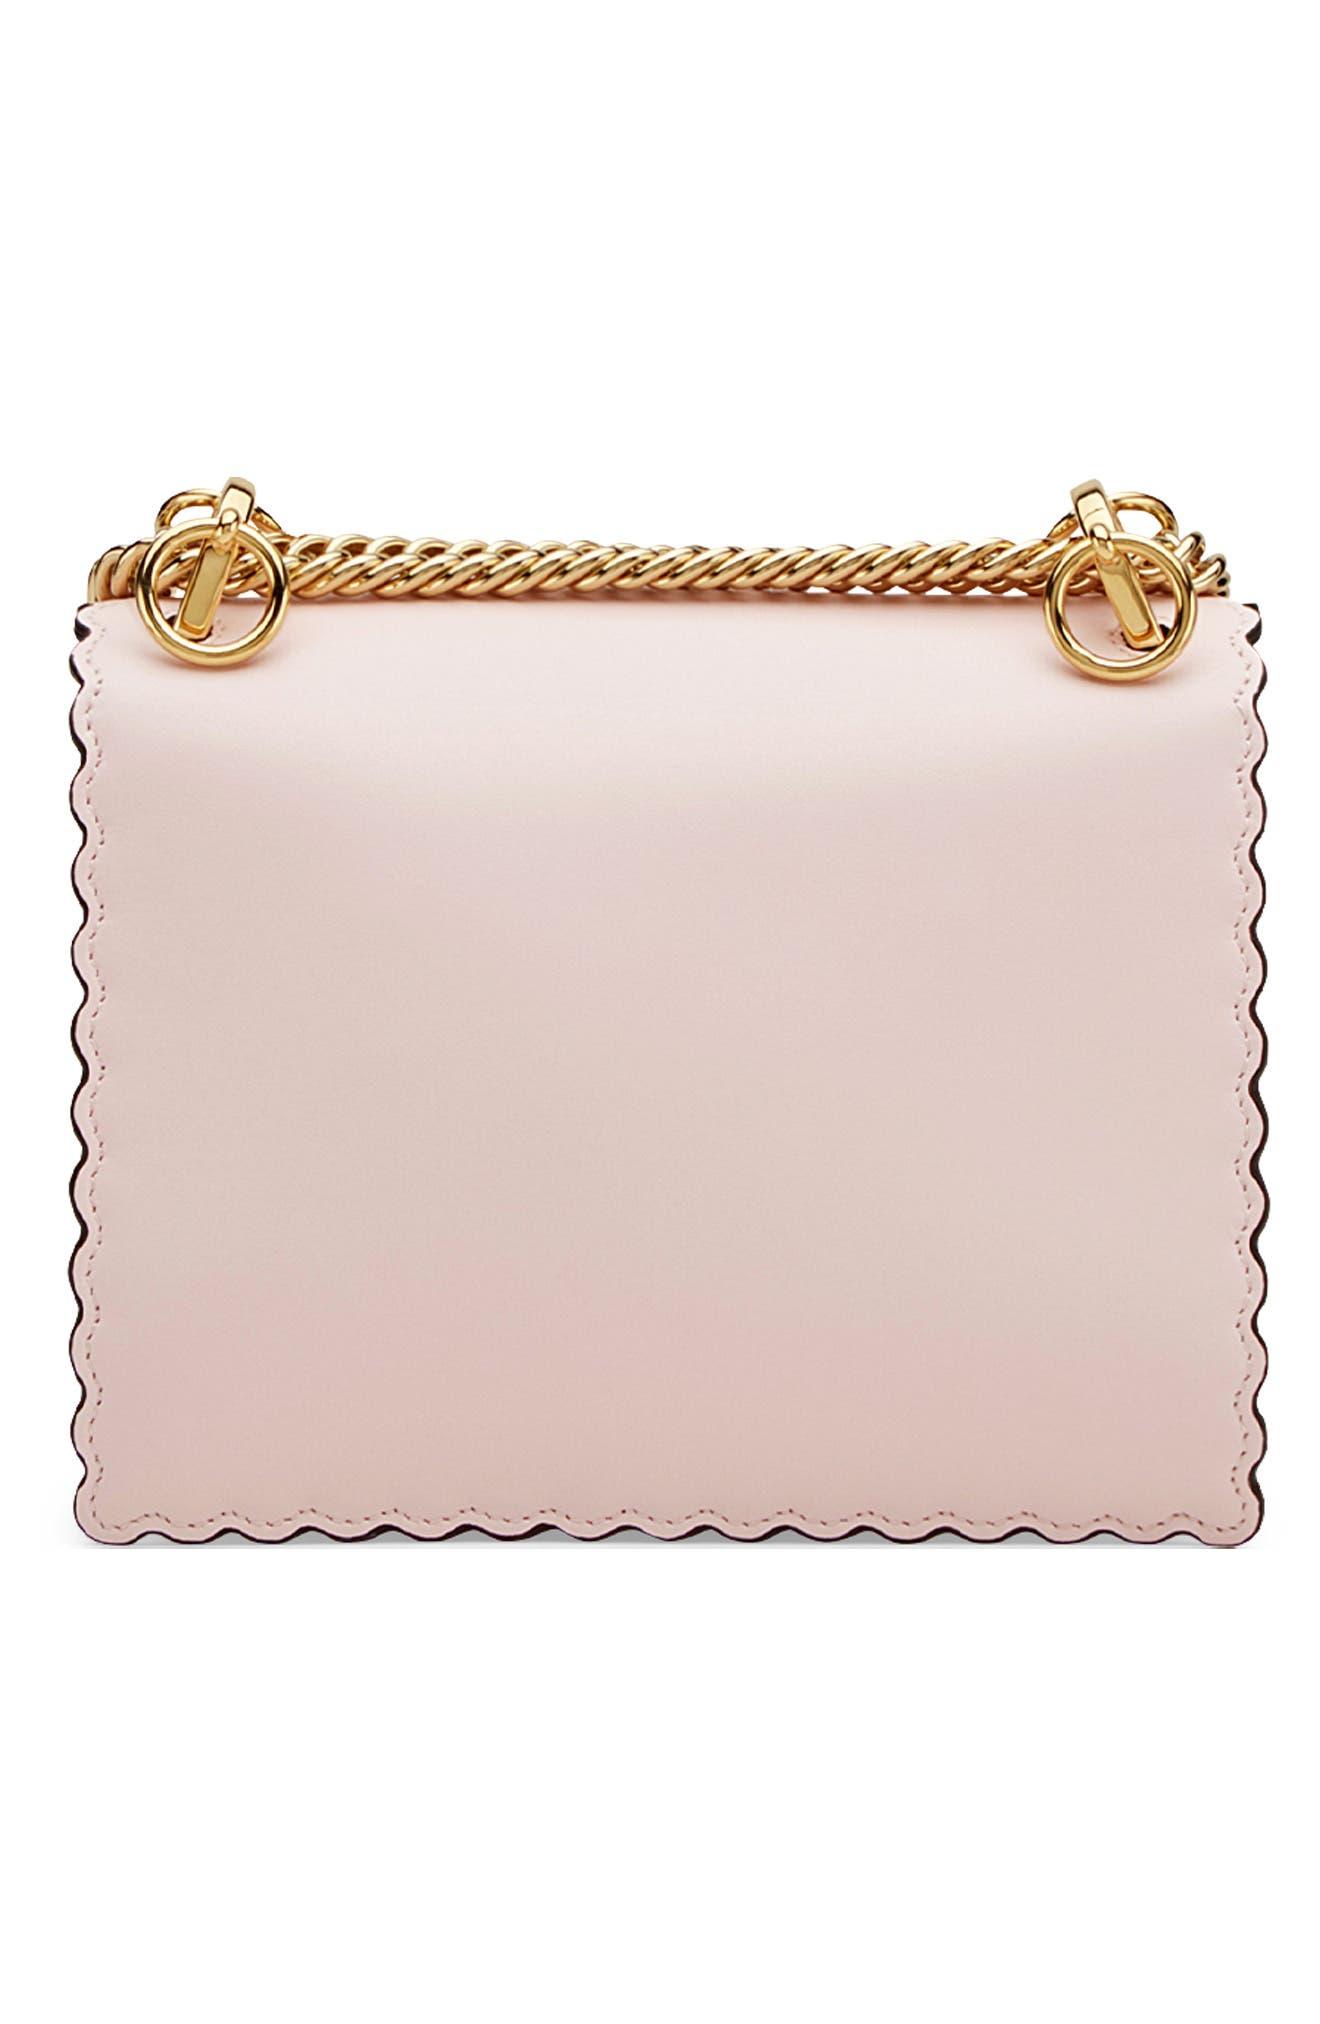 Mini Kan I Scalloped Leather Shoulder Bag,                             Alternate thumbnail 2, color,                             CONFETTO/ ORO SOFT